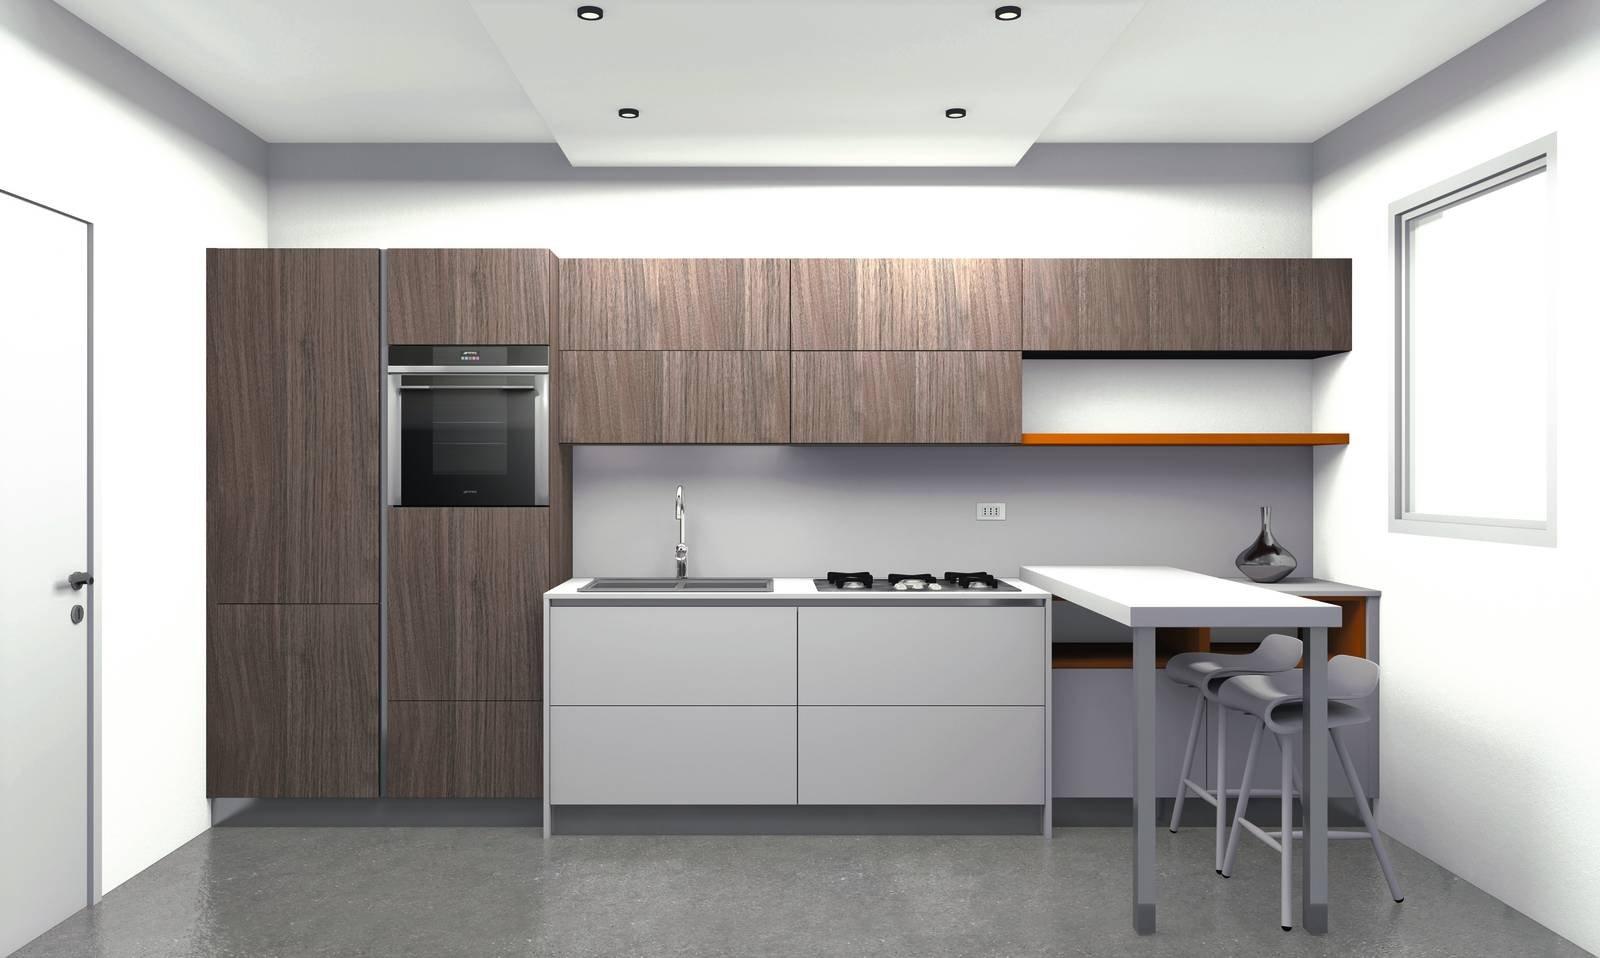 Stunning Progetti Cucine Piccole Images - Design & Ideas 2018 ...